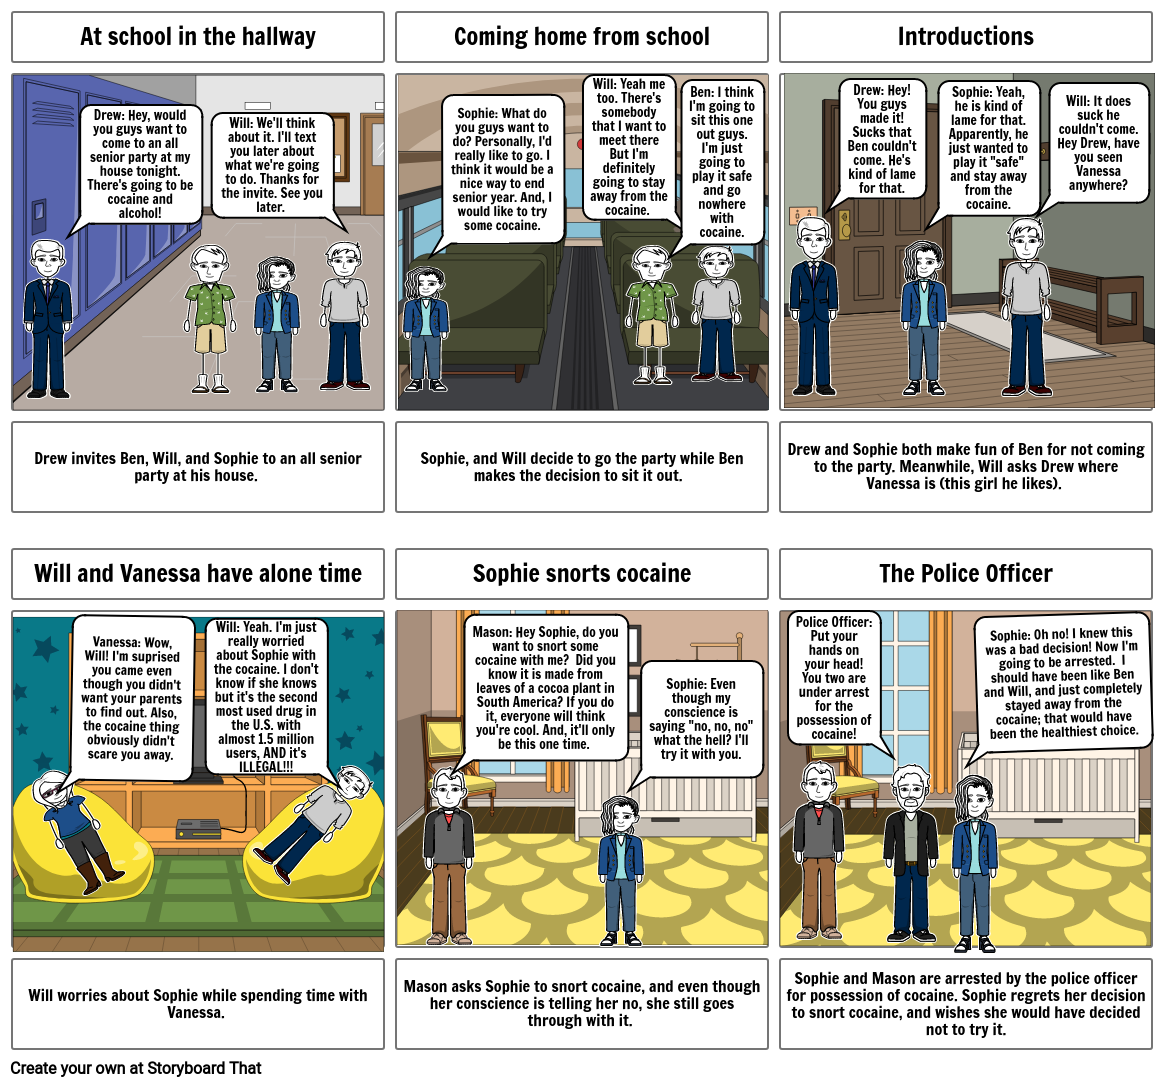 Comic Strip About DECIDE